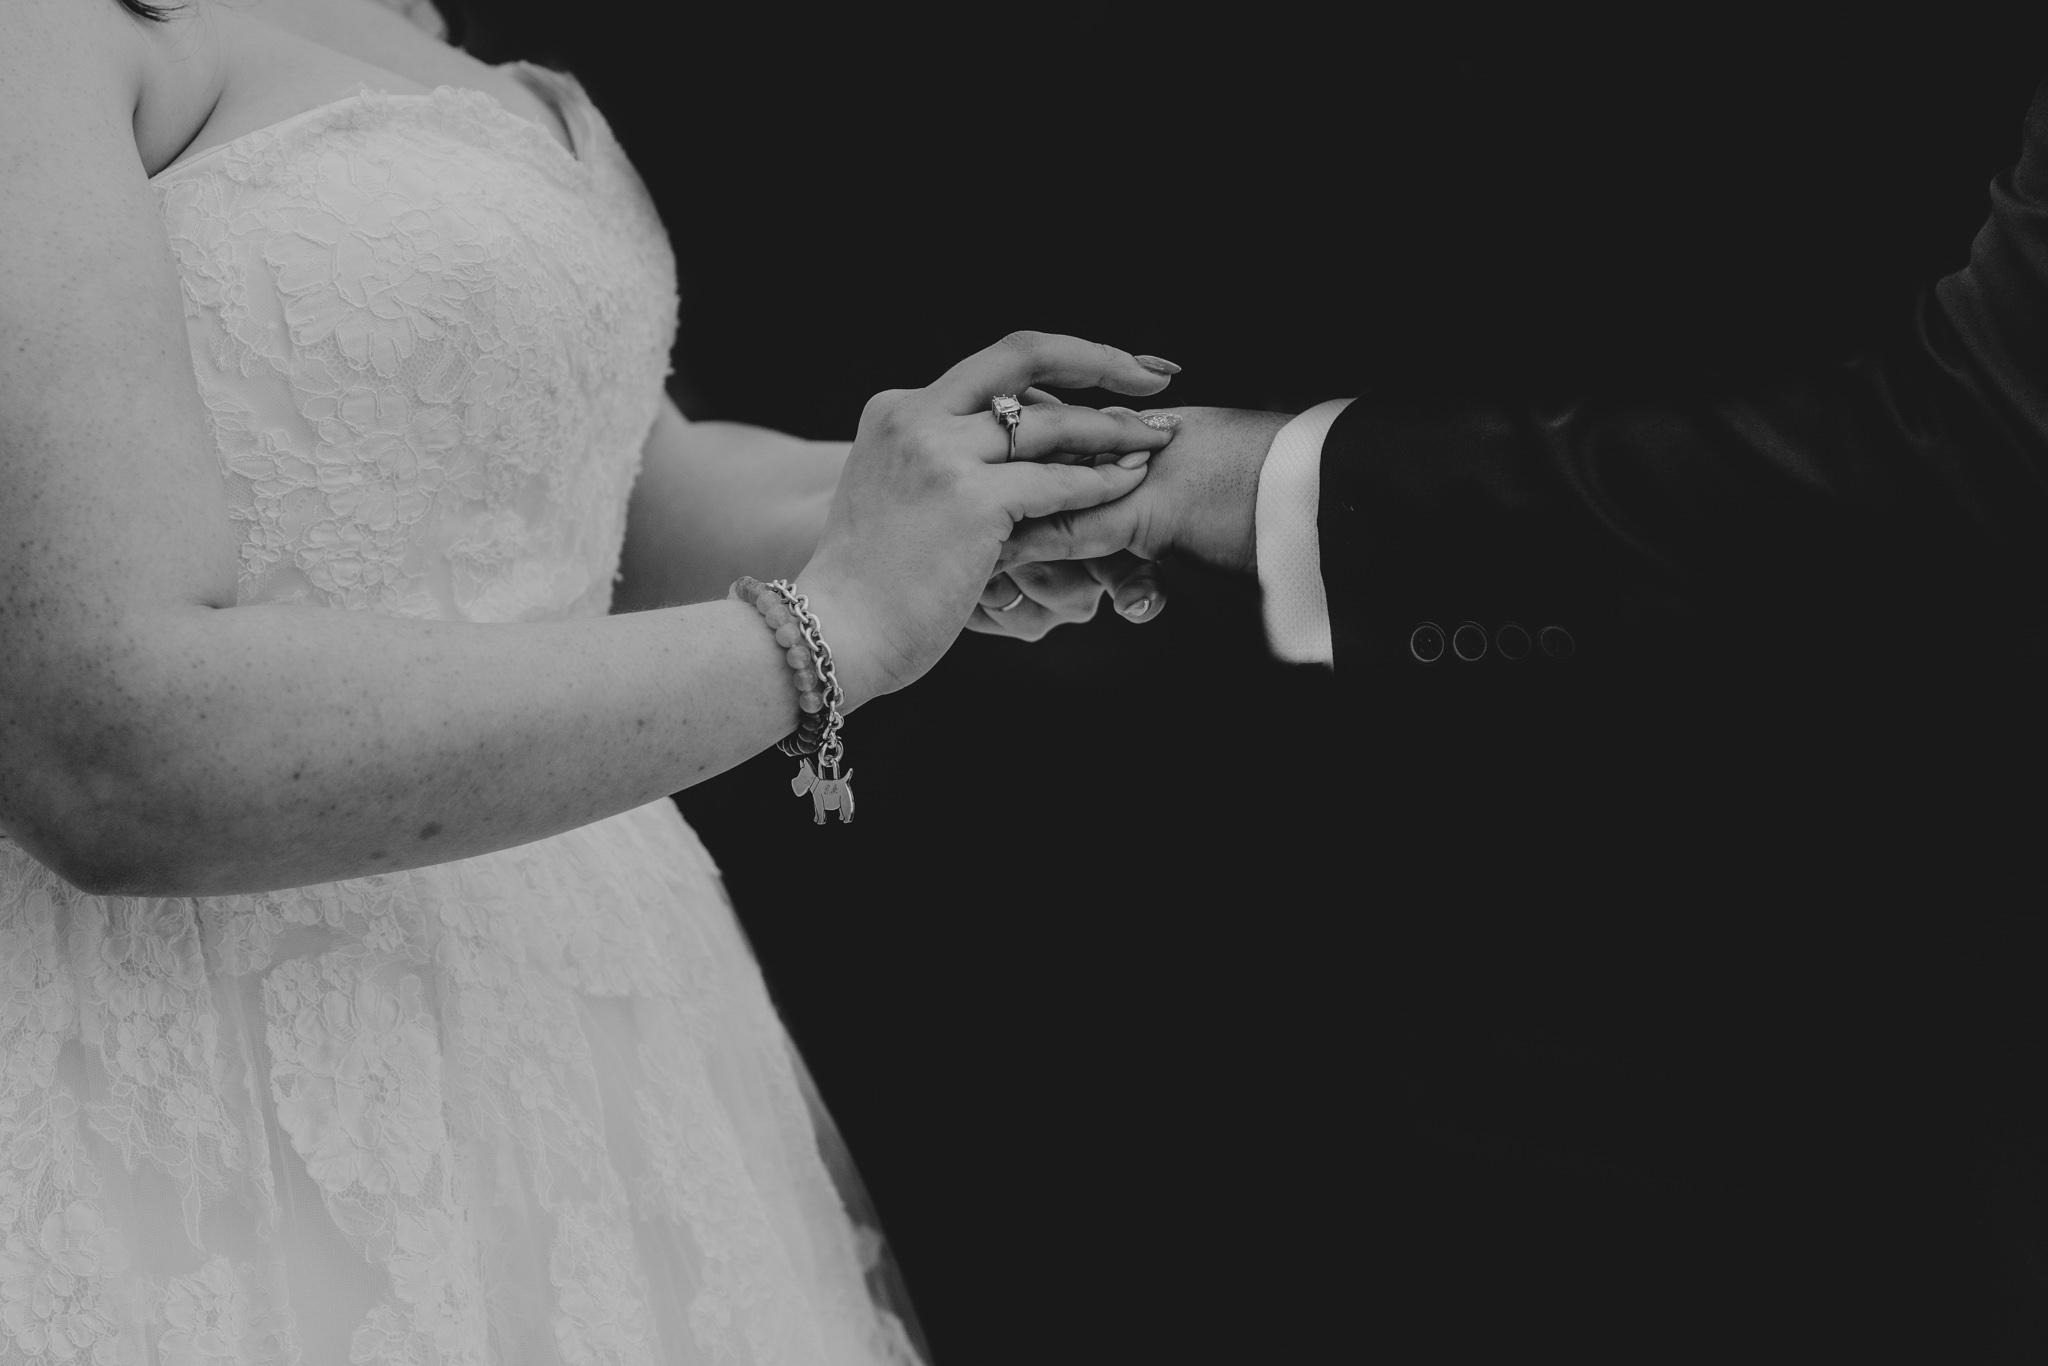 grace-sam-old-barn-clovelly-devon-wedding-photographer-grace-elizabeth-essex-suffolk-norfolk-wedding-photographer (59 of 132).jpg